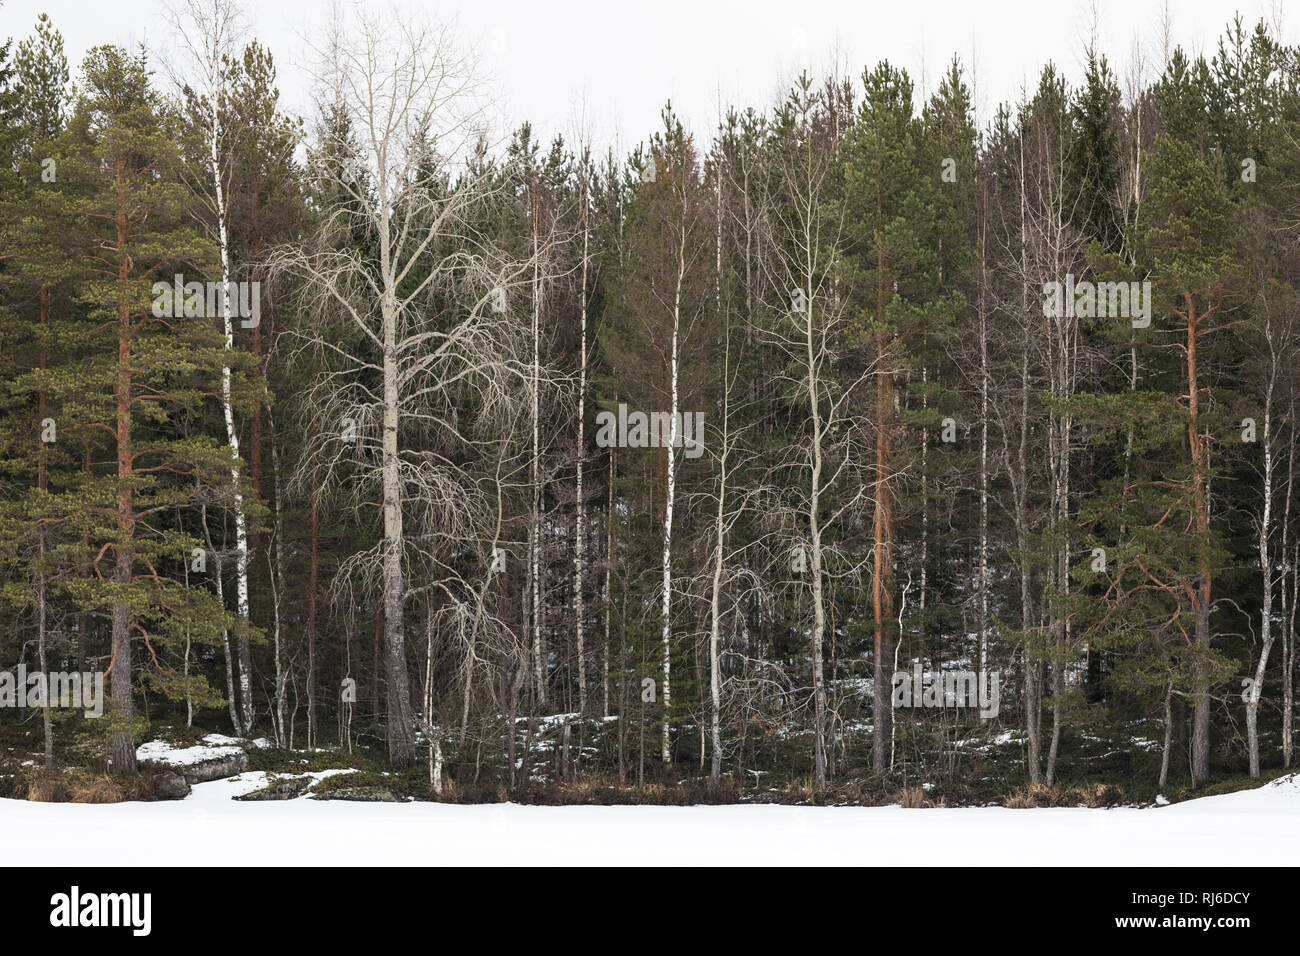 Finnland, verschiedene Bäume am Waldrand, Espen, Kiefern, Birken Stock Photo